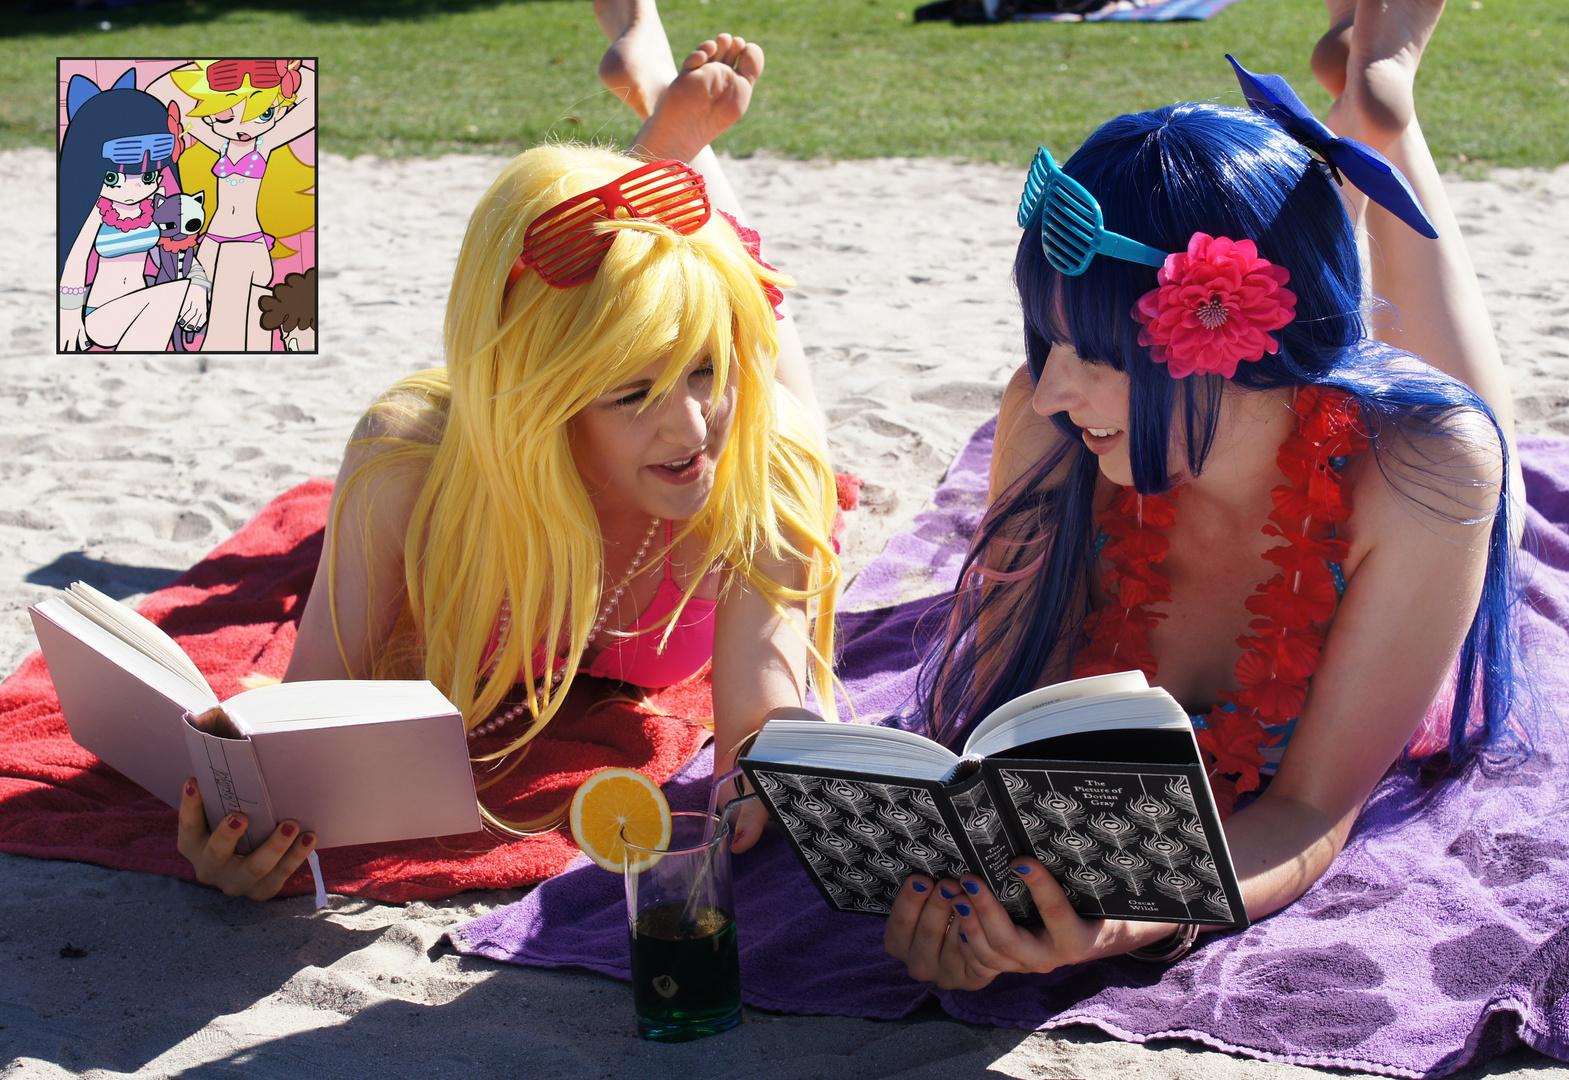 Panty & Stocking @ Daten Beach – Reading books